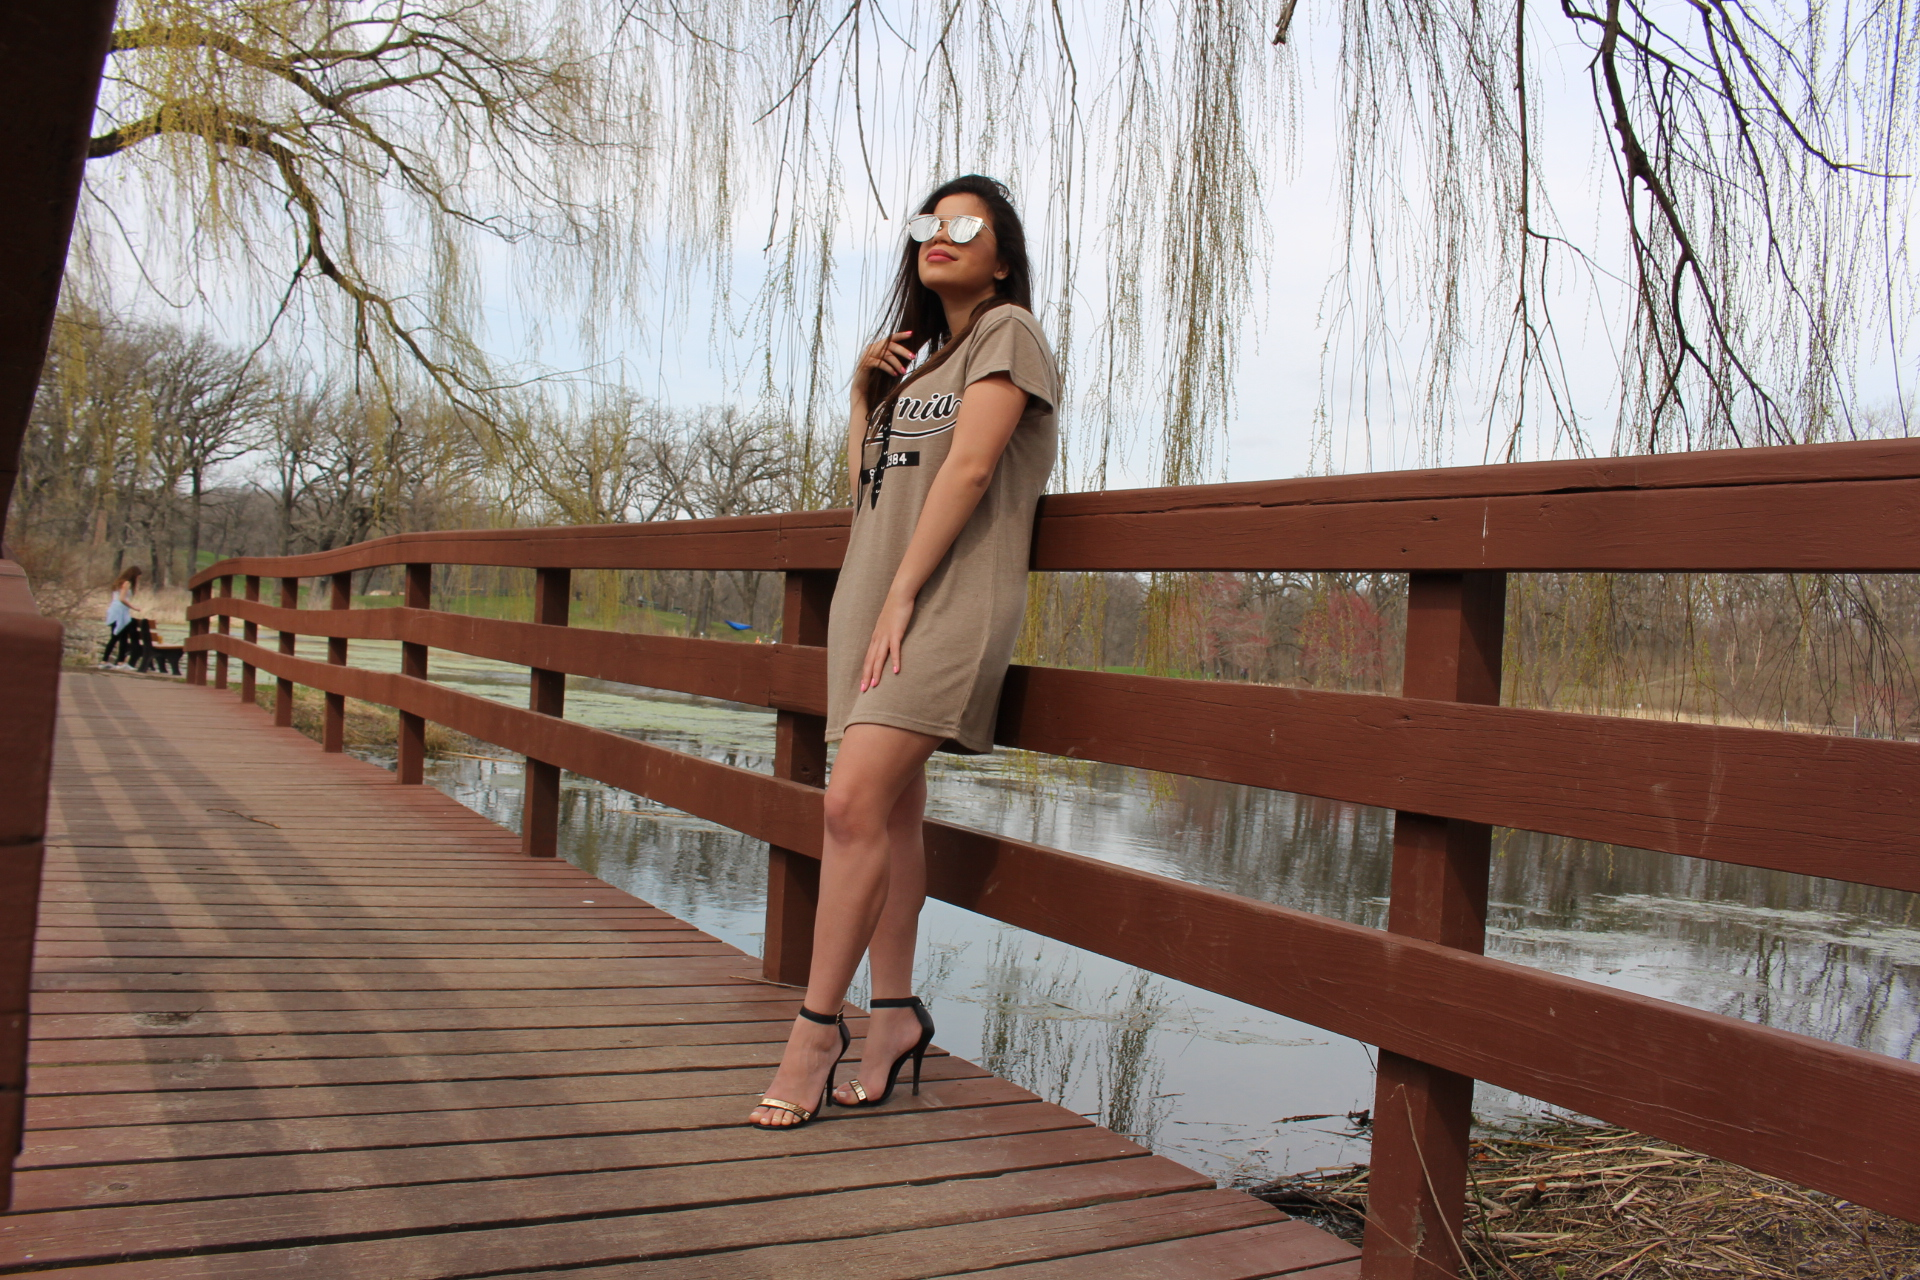 Nude dress outfit sojos vision sunglasses details steve madden sandals by Alejandra Avila